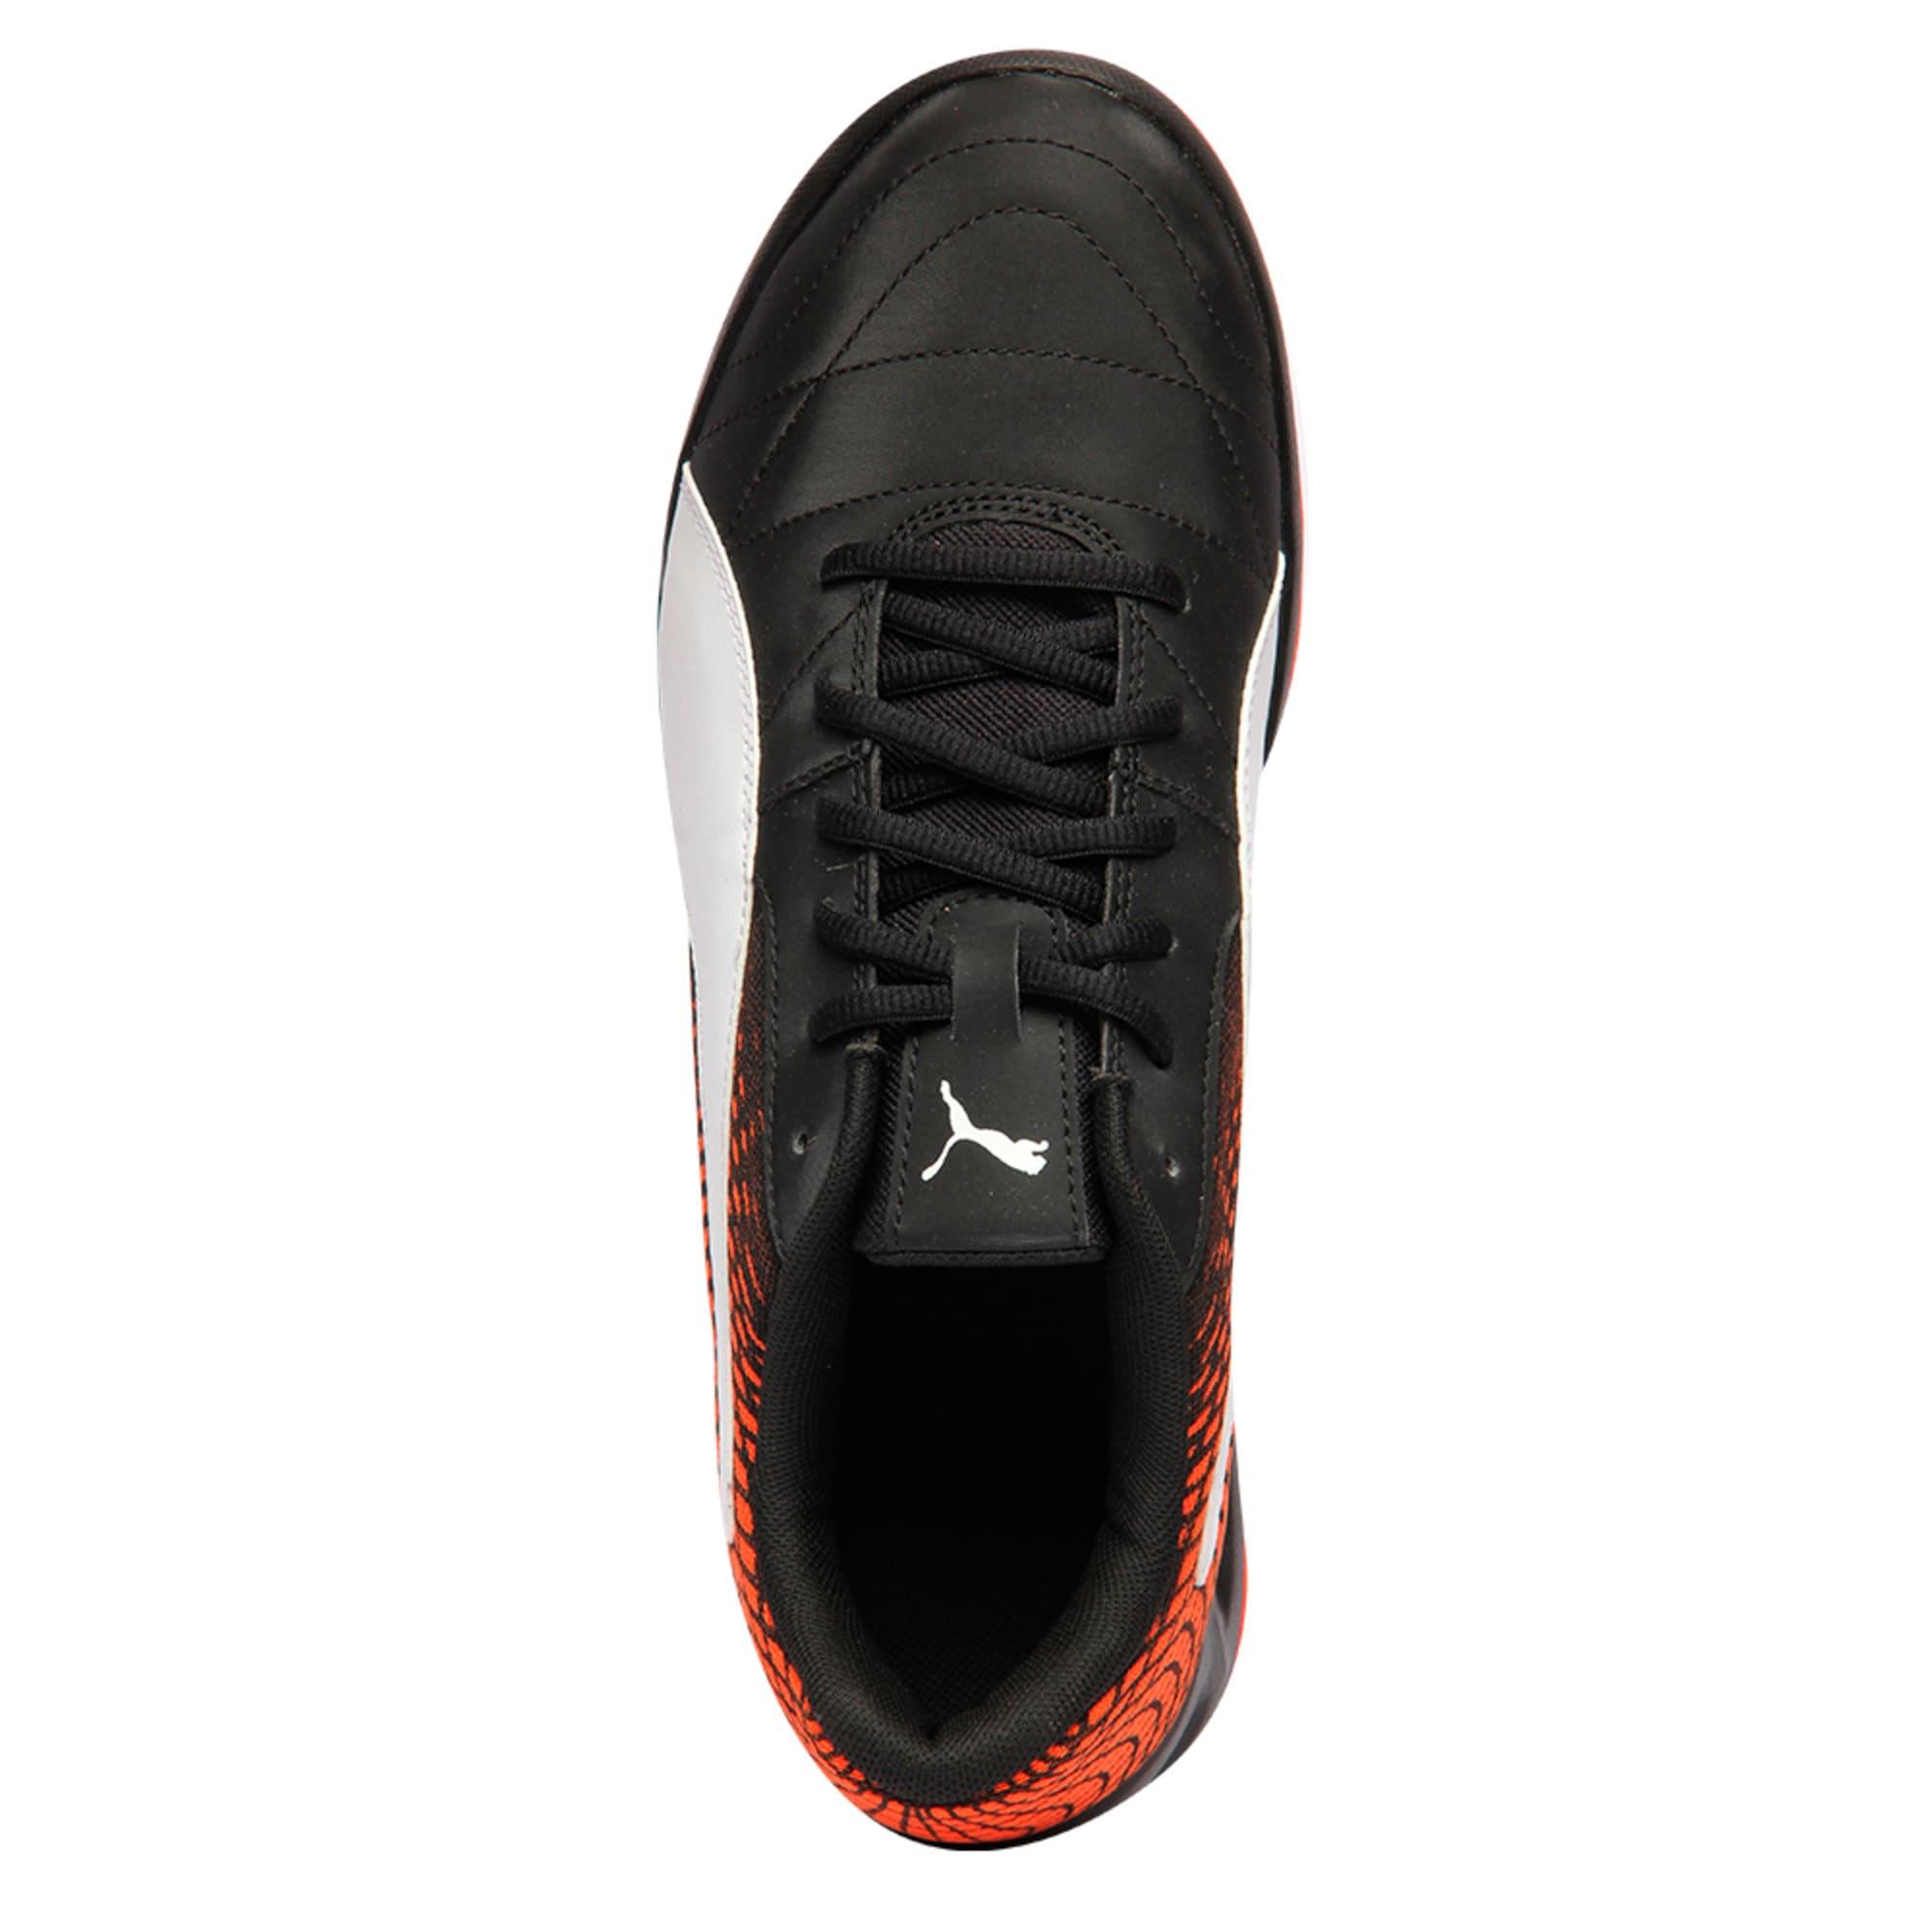 Thumbnail 3 of Veloz Indoor NG Training Shoes, Black-White-Cherry, medium-IND